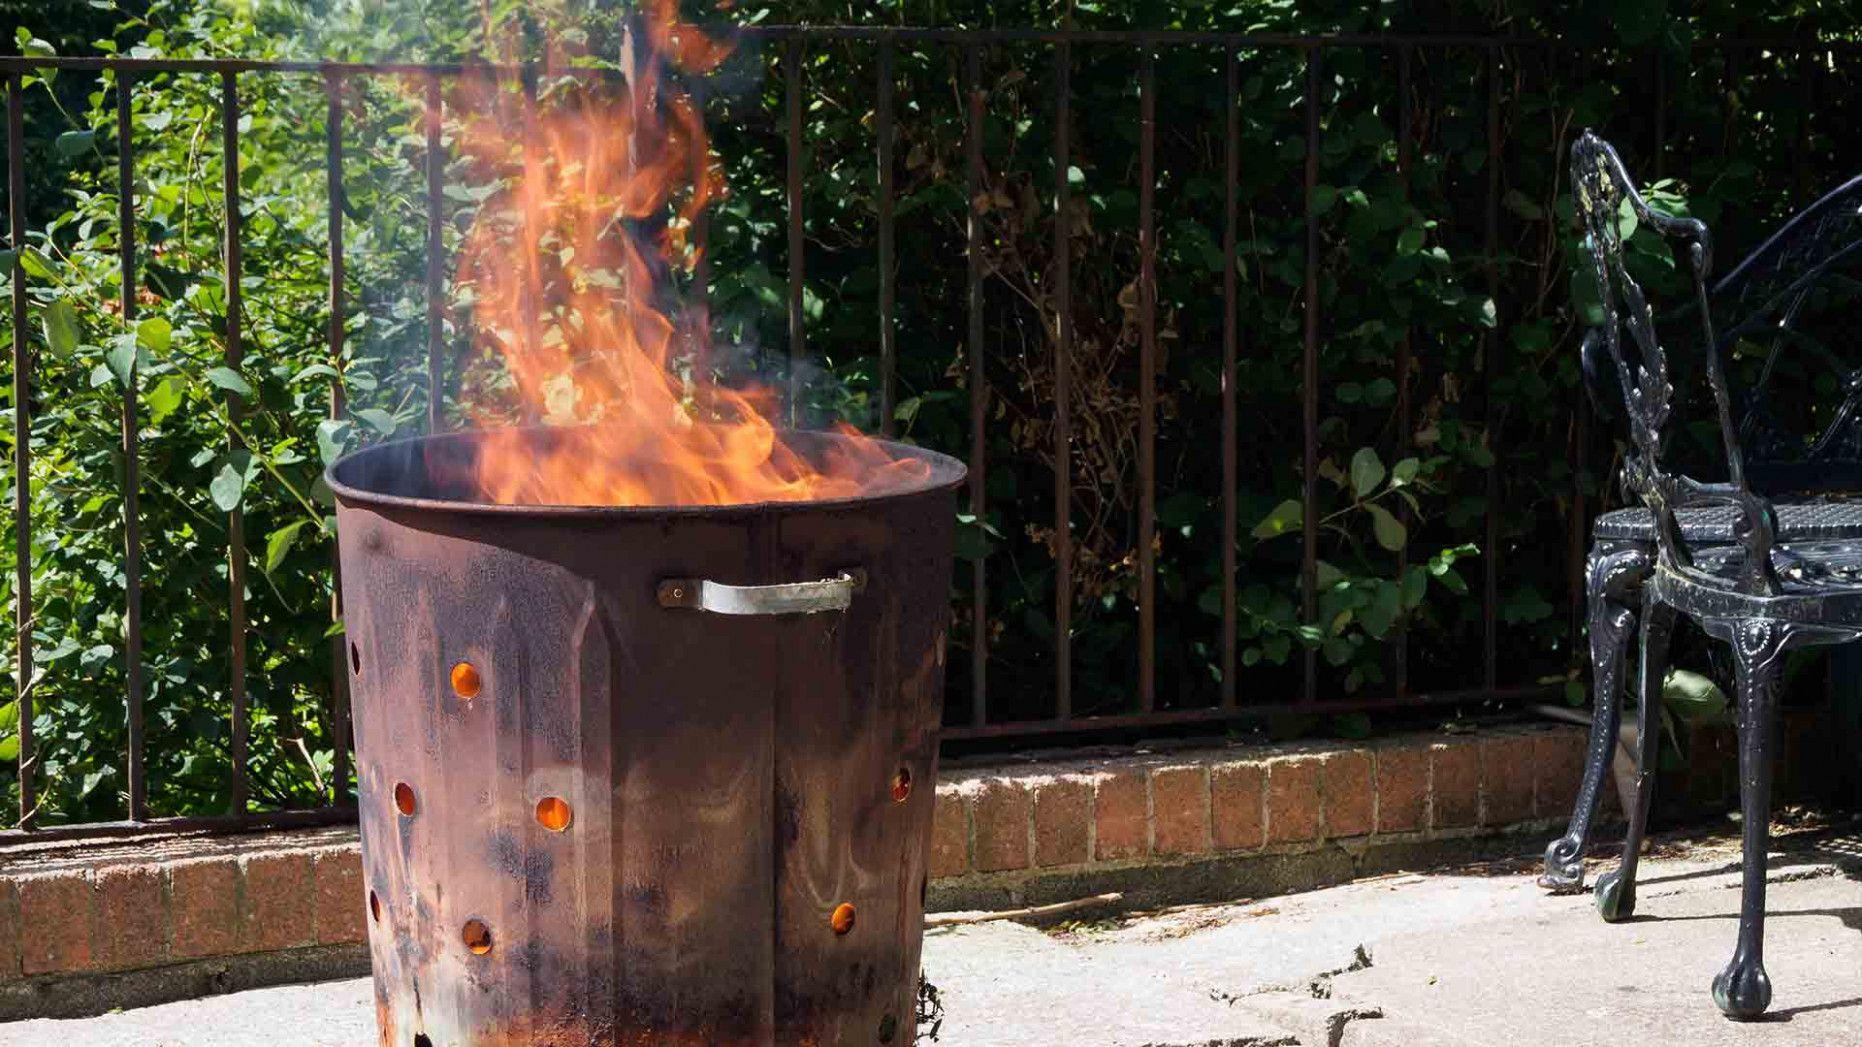 Straftaten Feuer Im Garten In 2021 Feuerschale Feuerschalen Garten Garten